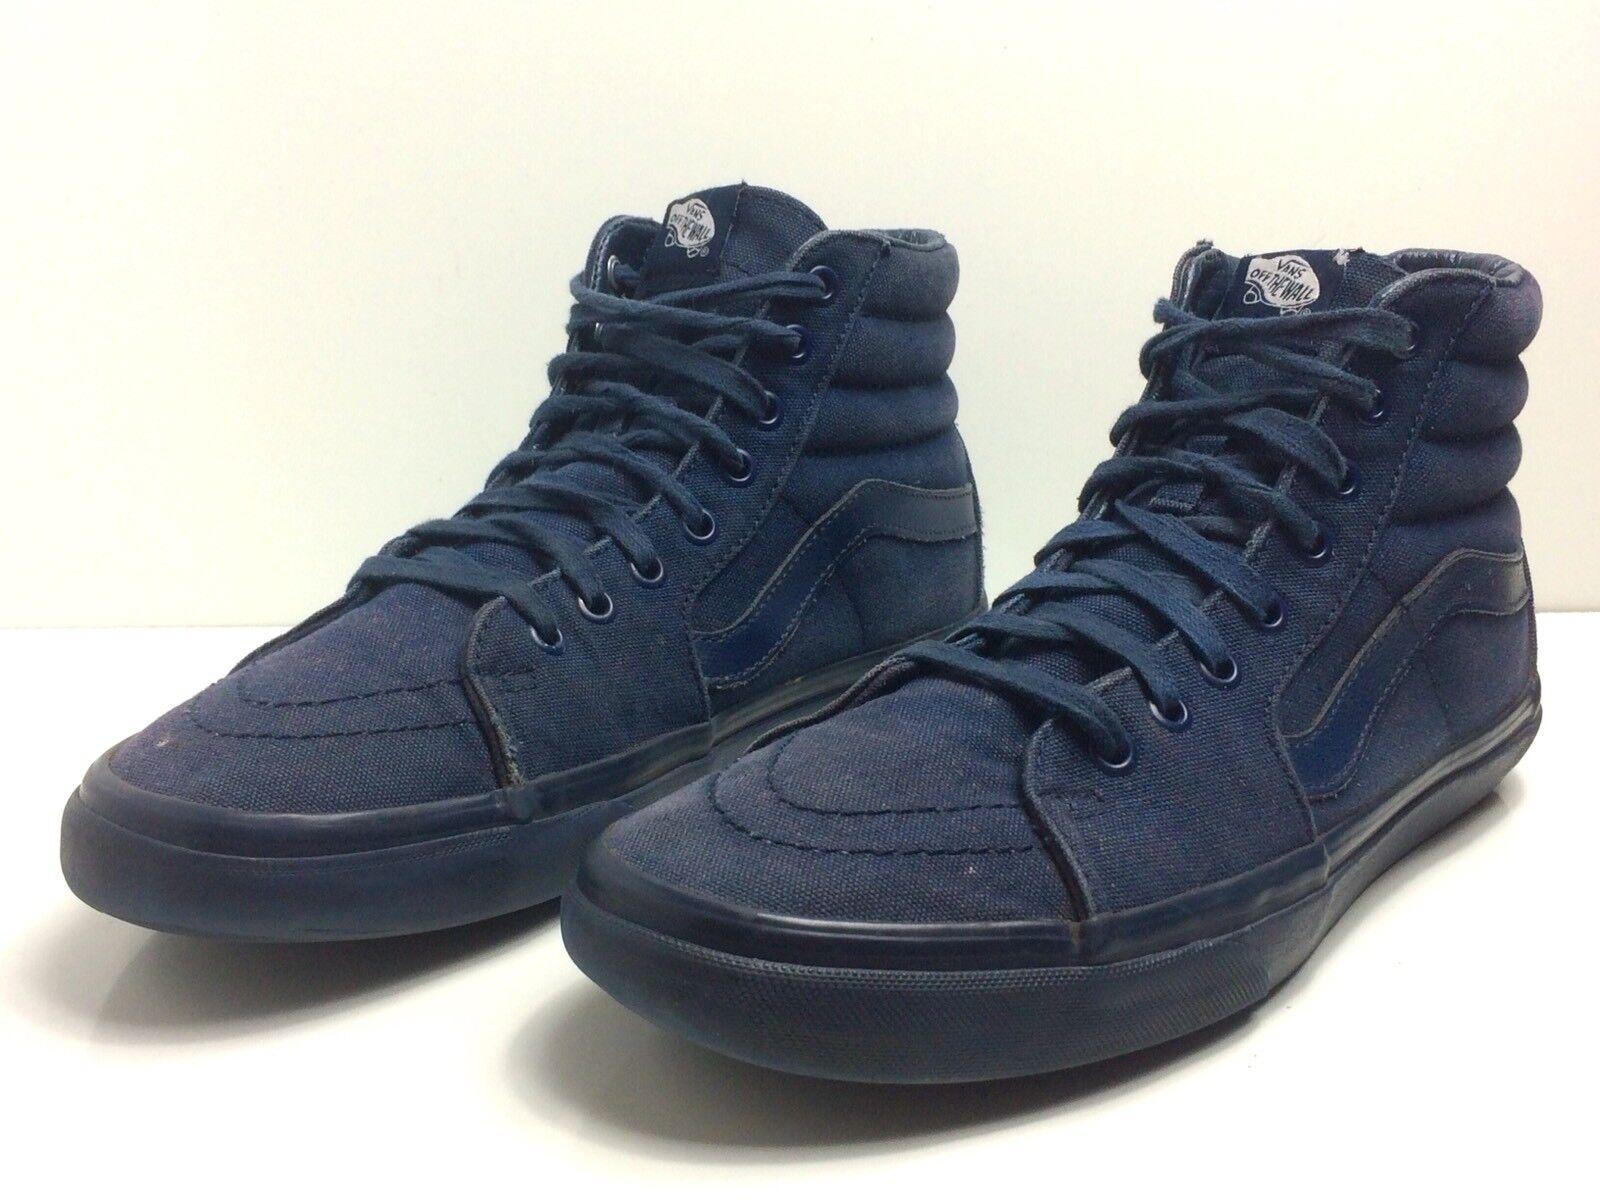 best sneakers 5c08c b0ad9 VANS Mens US 9.5 High High High Top Canvas Blue Skateboard Shoes 870cf6